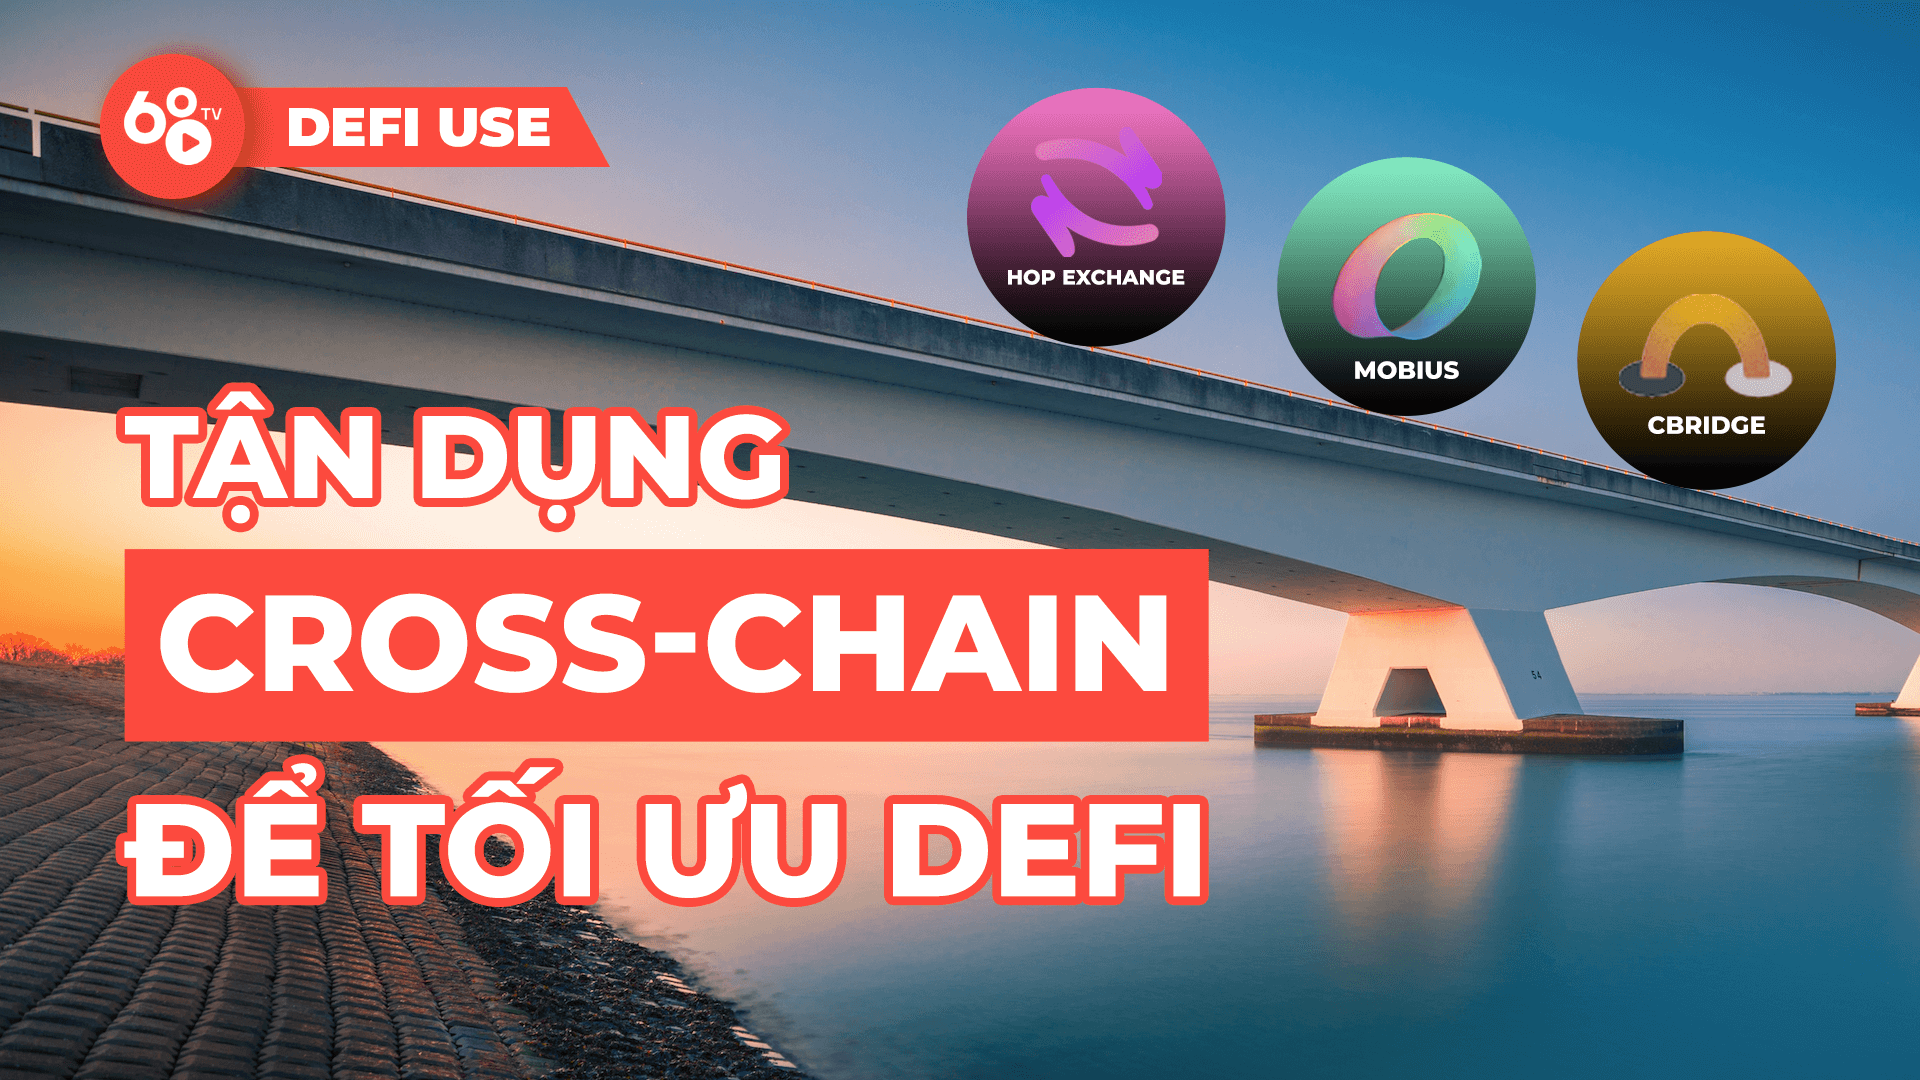 DeFi Use: Sử dụng cross-chain để tối ưu DeFi – Trải nghiệm Mobius, cBridge của Celer & Hop Exchange